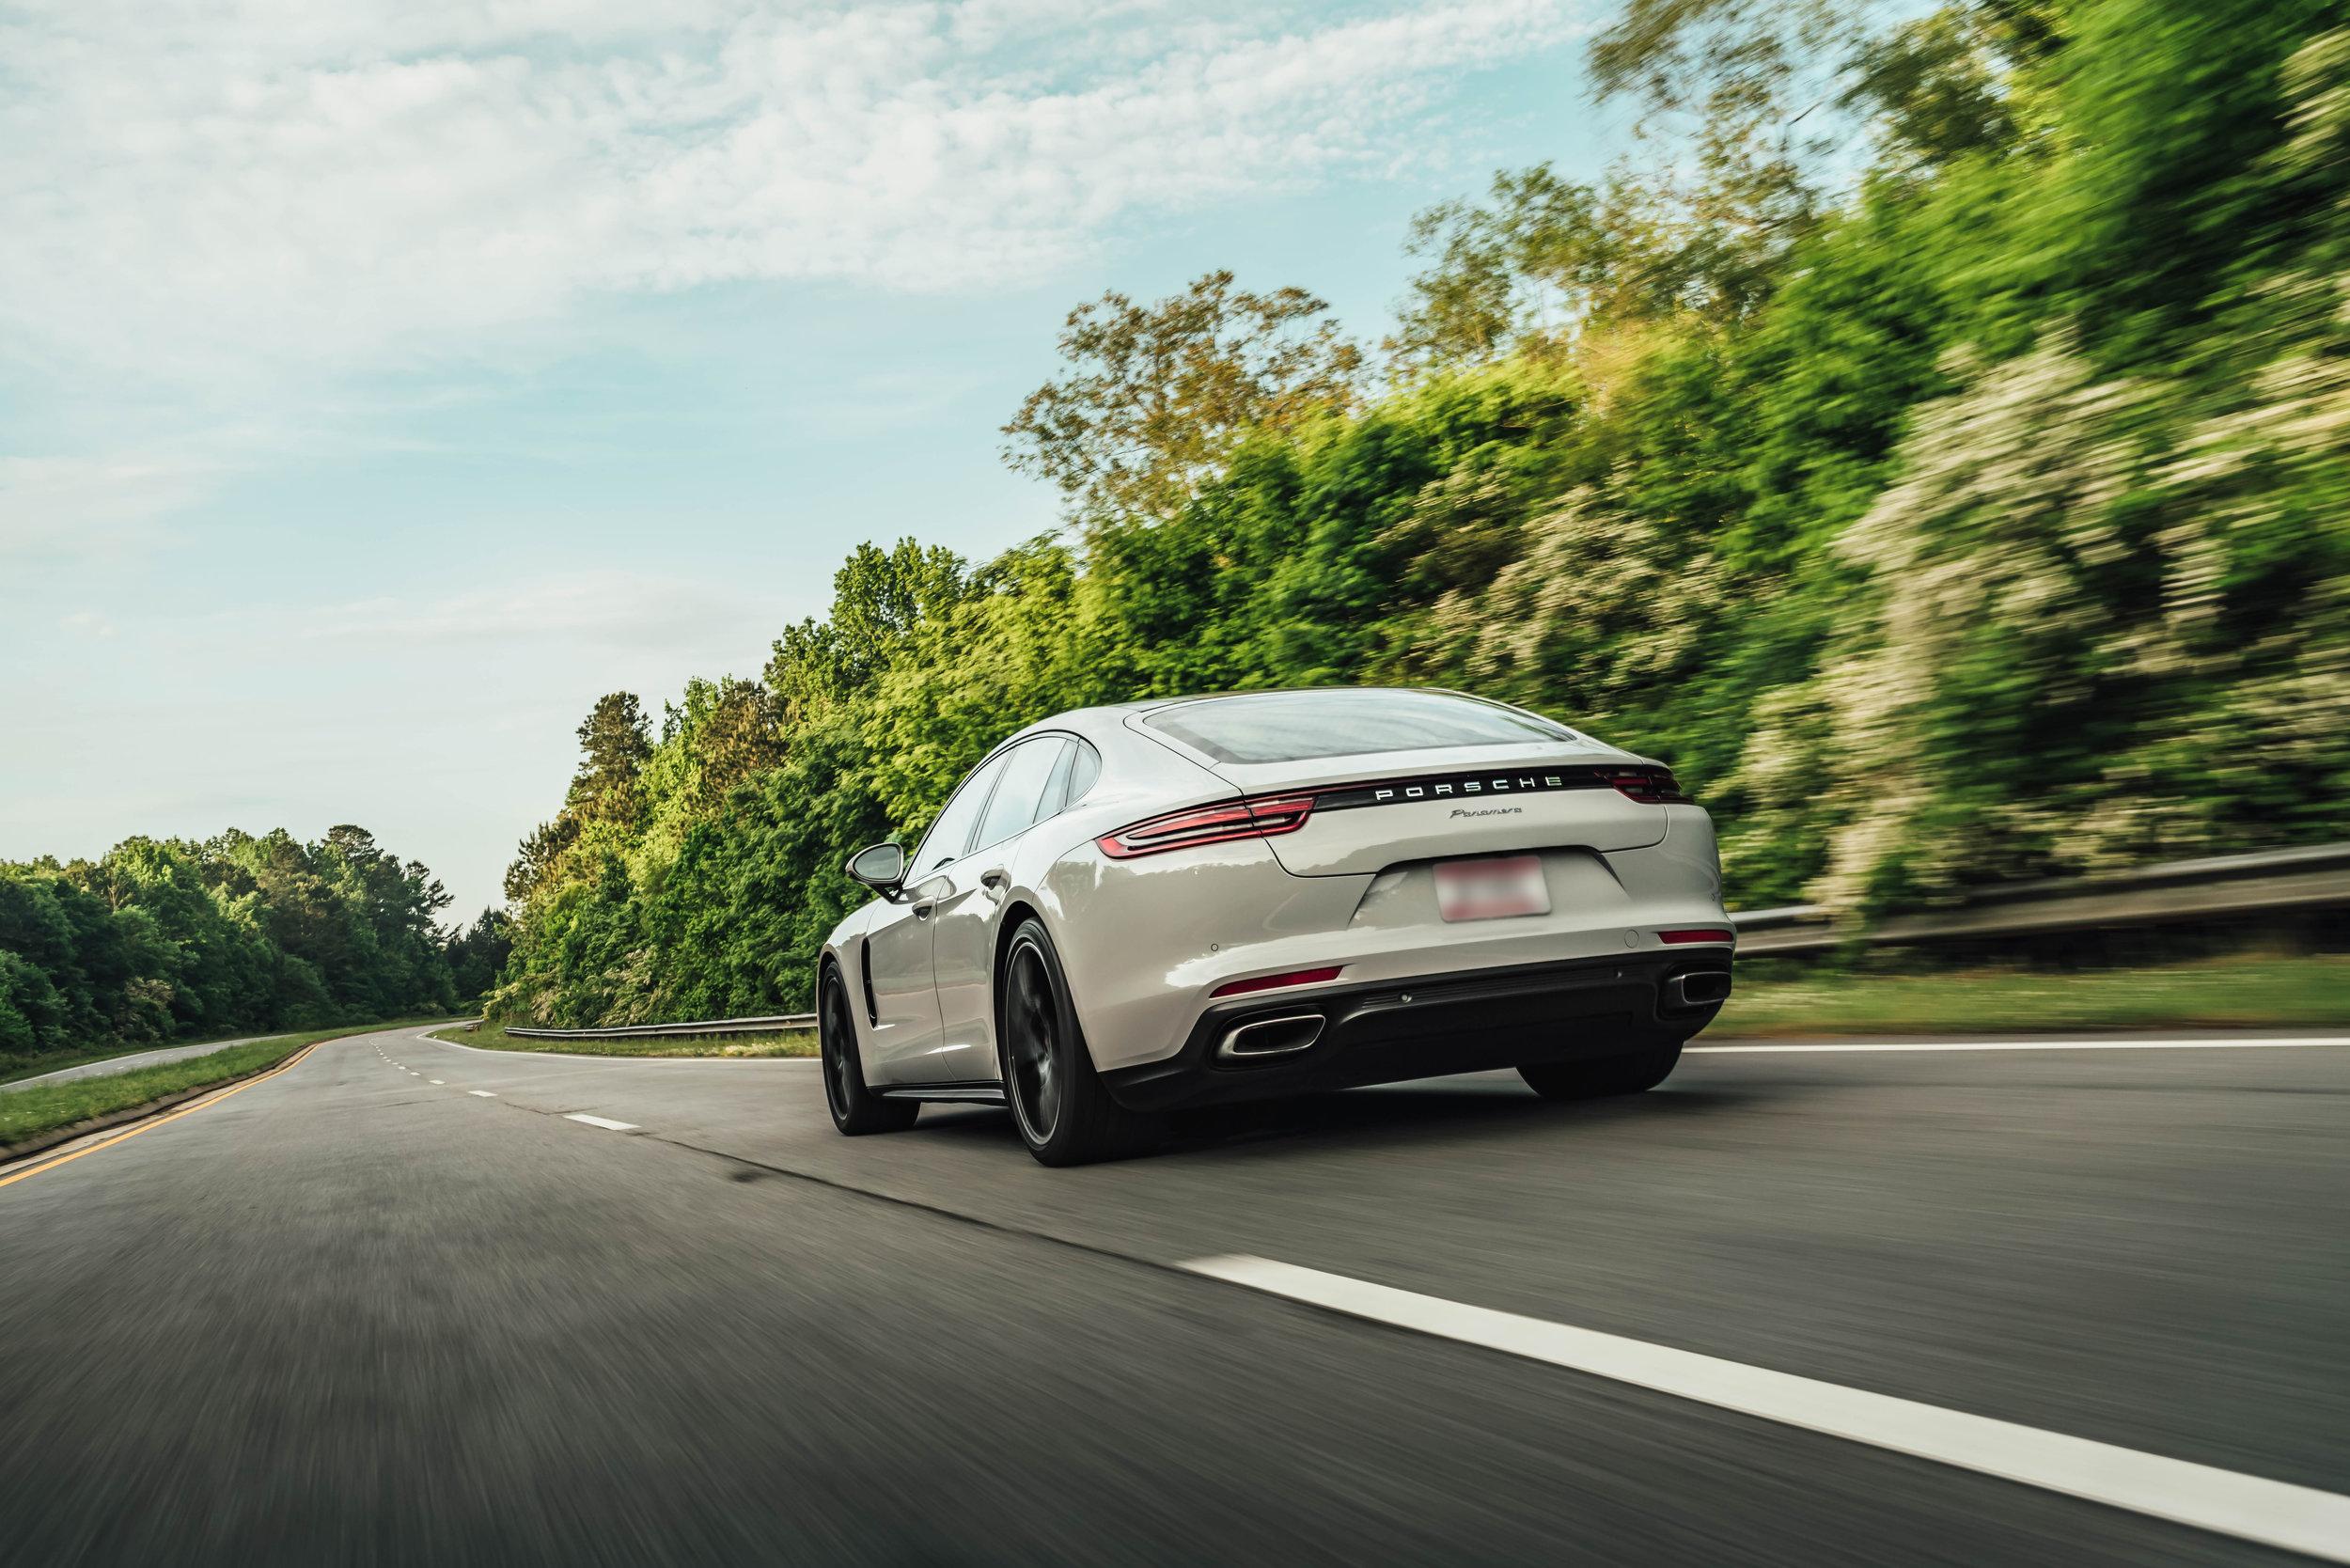 20190504 Porsche-4 Blur.jpg